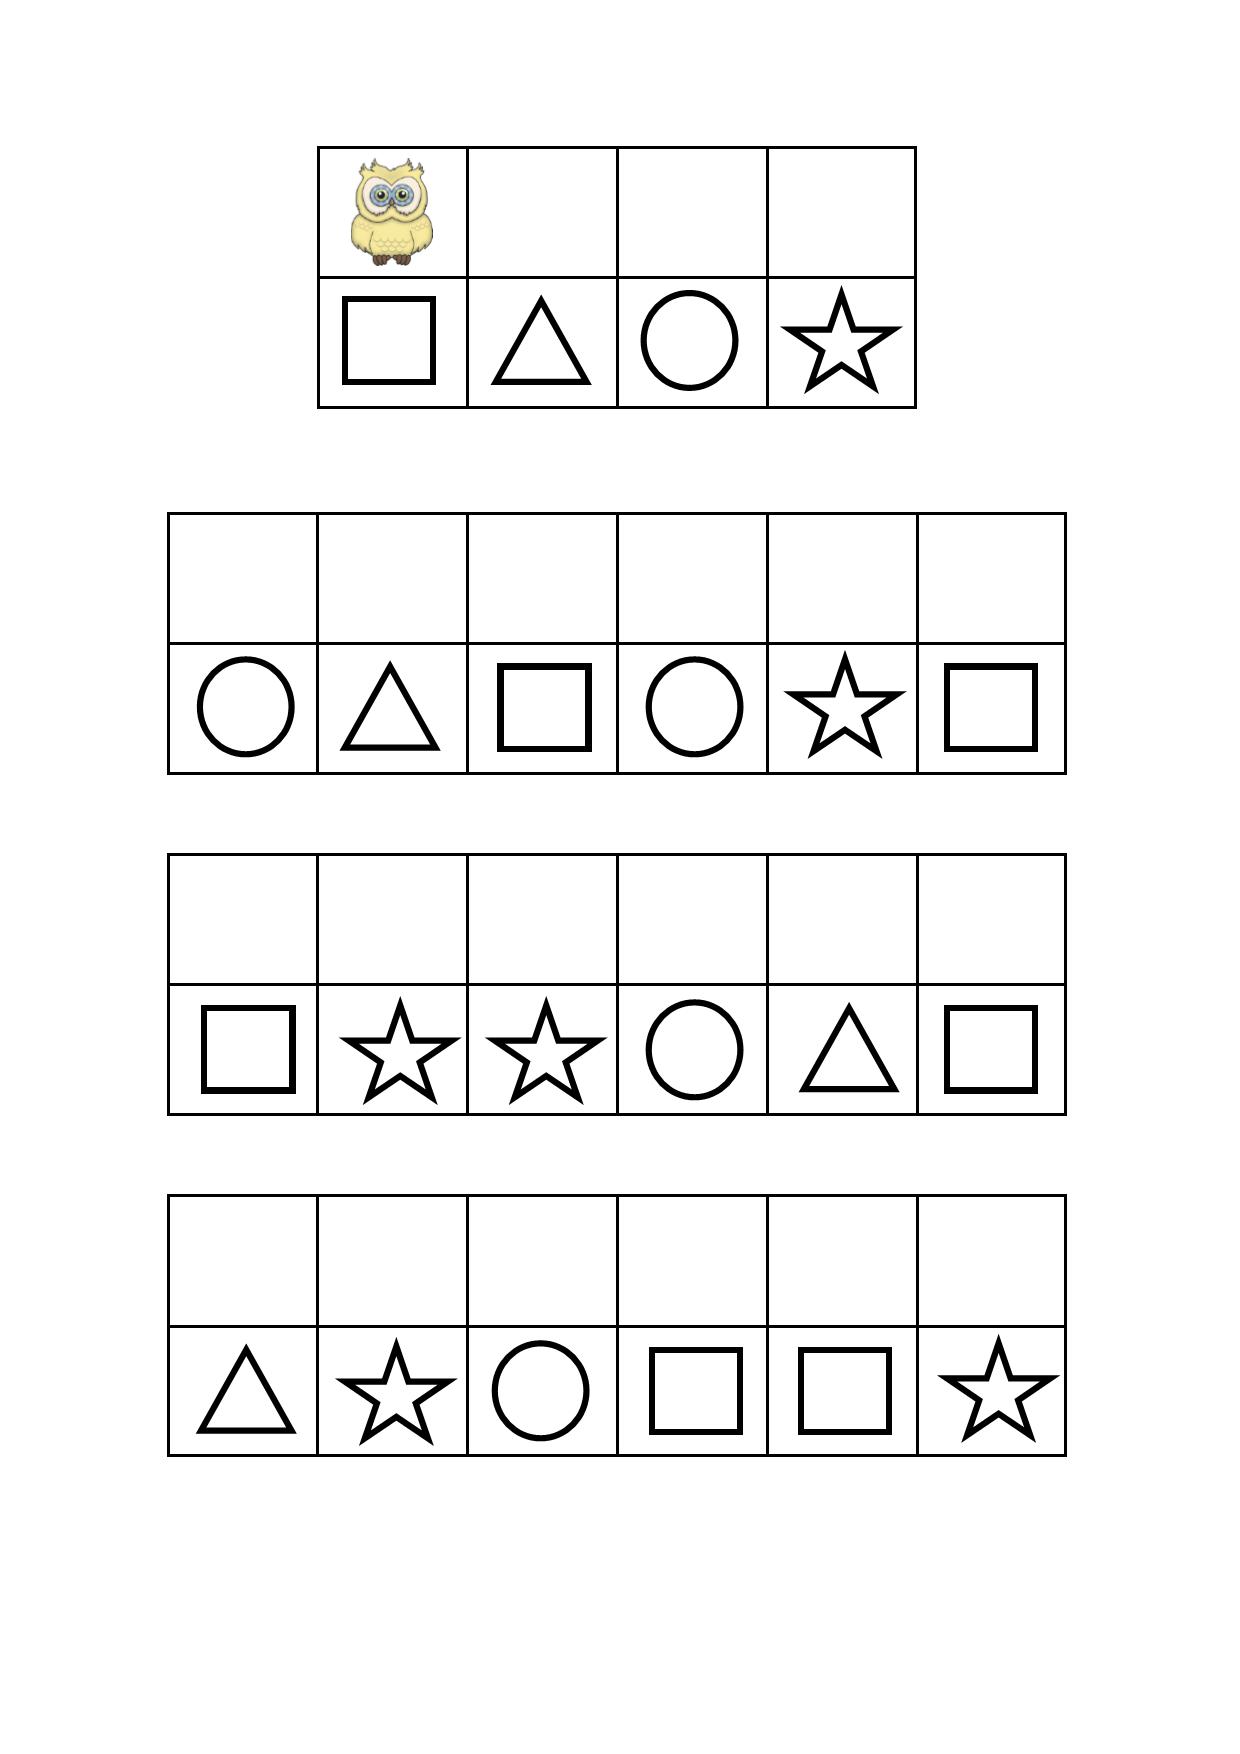 Tiles for the owl visual perception game. Find the belonging board on Autismespektrum on Pinterest. By Autismespektrum